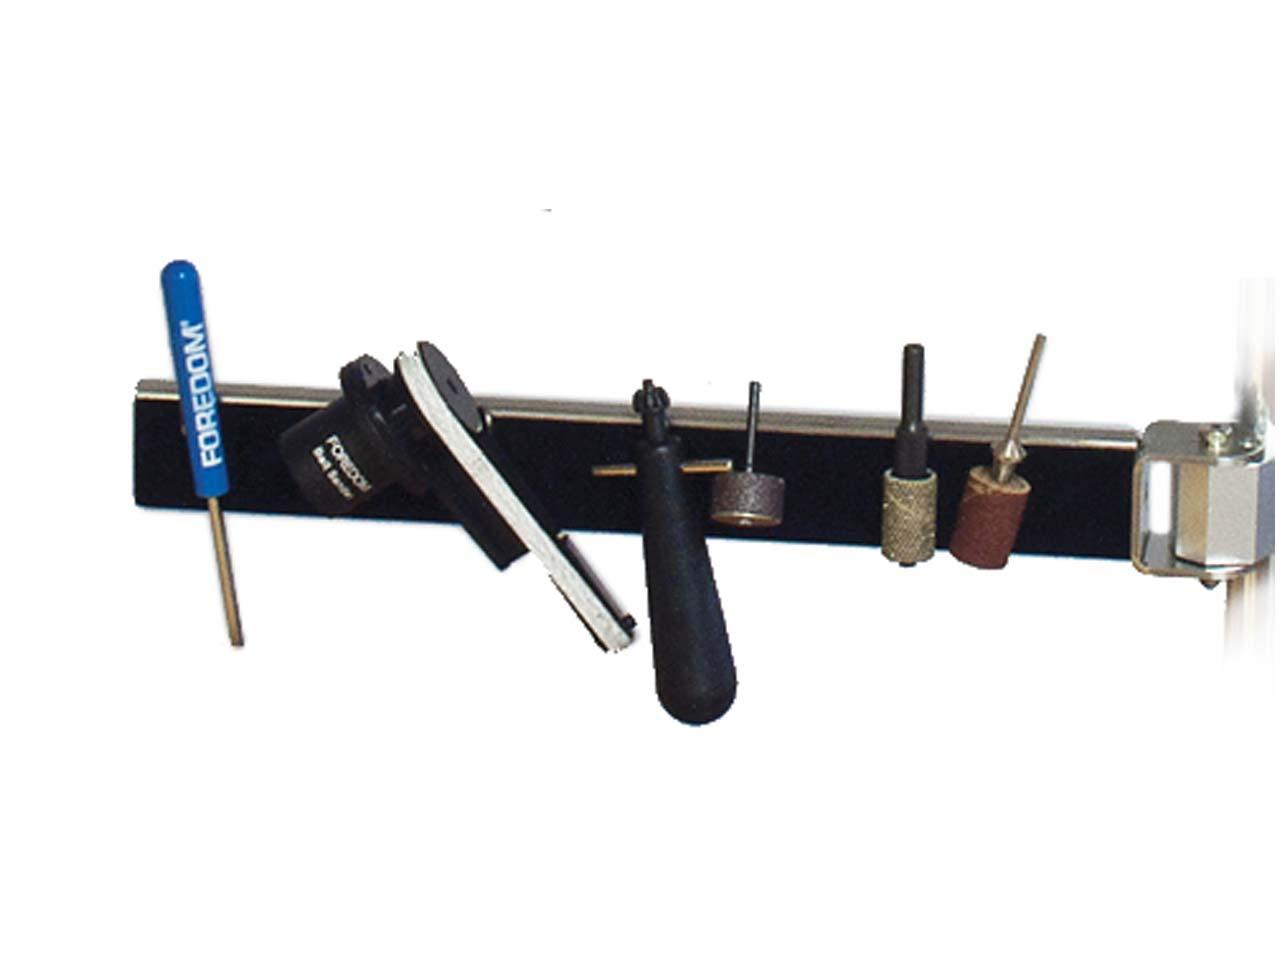 Genuine-US-Foredom-Workbench-Accessories-System miniatura 30